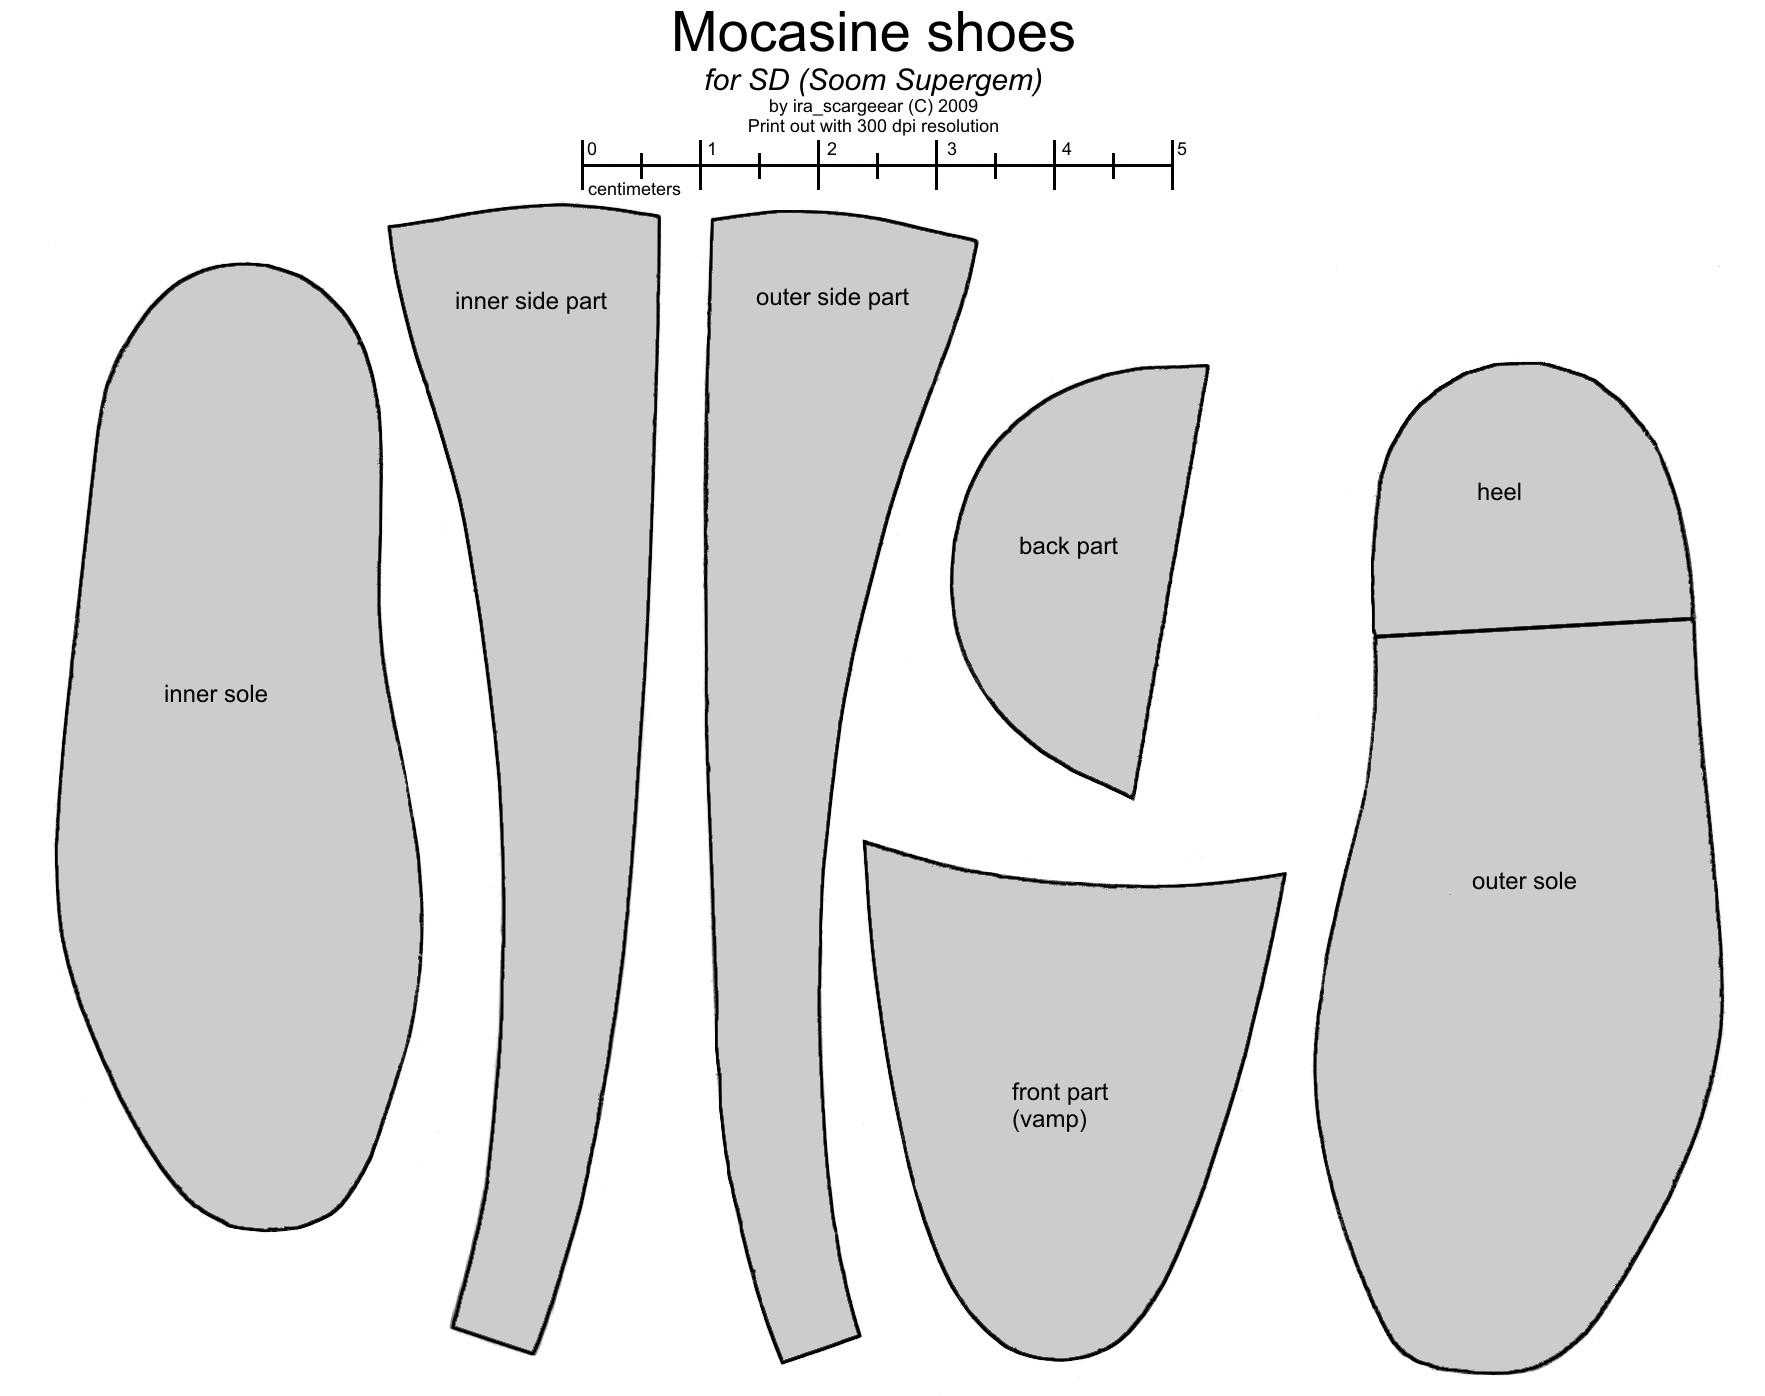 SD BJD (Soom Supergem) mocasines by scargeear